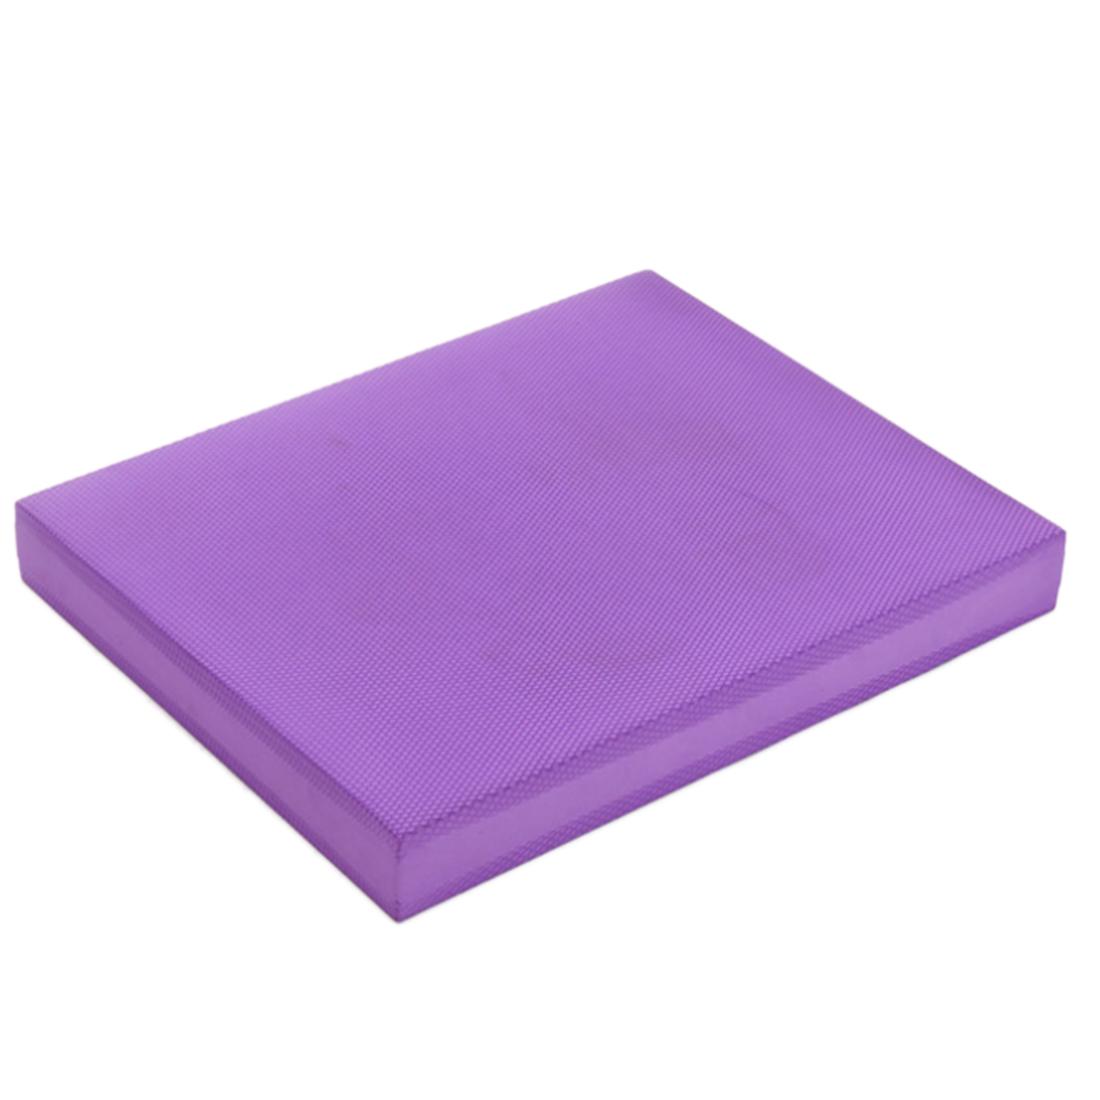 2017 Wholesale Non Slip Yoga Balance Pad Thicken Yoga Mat